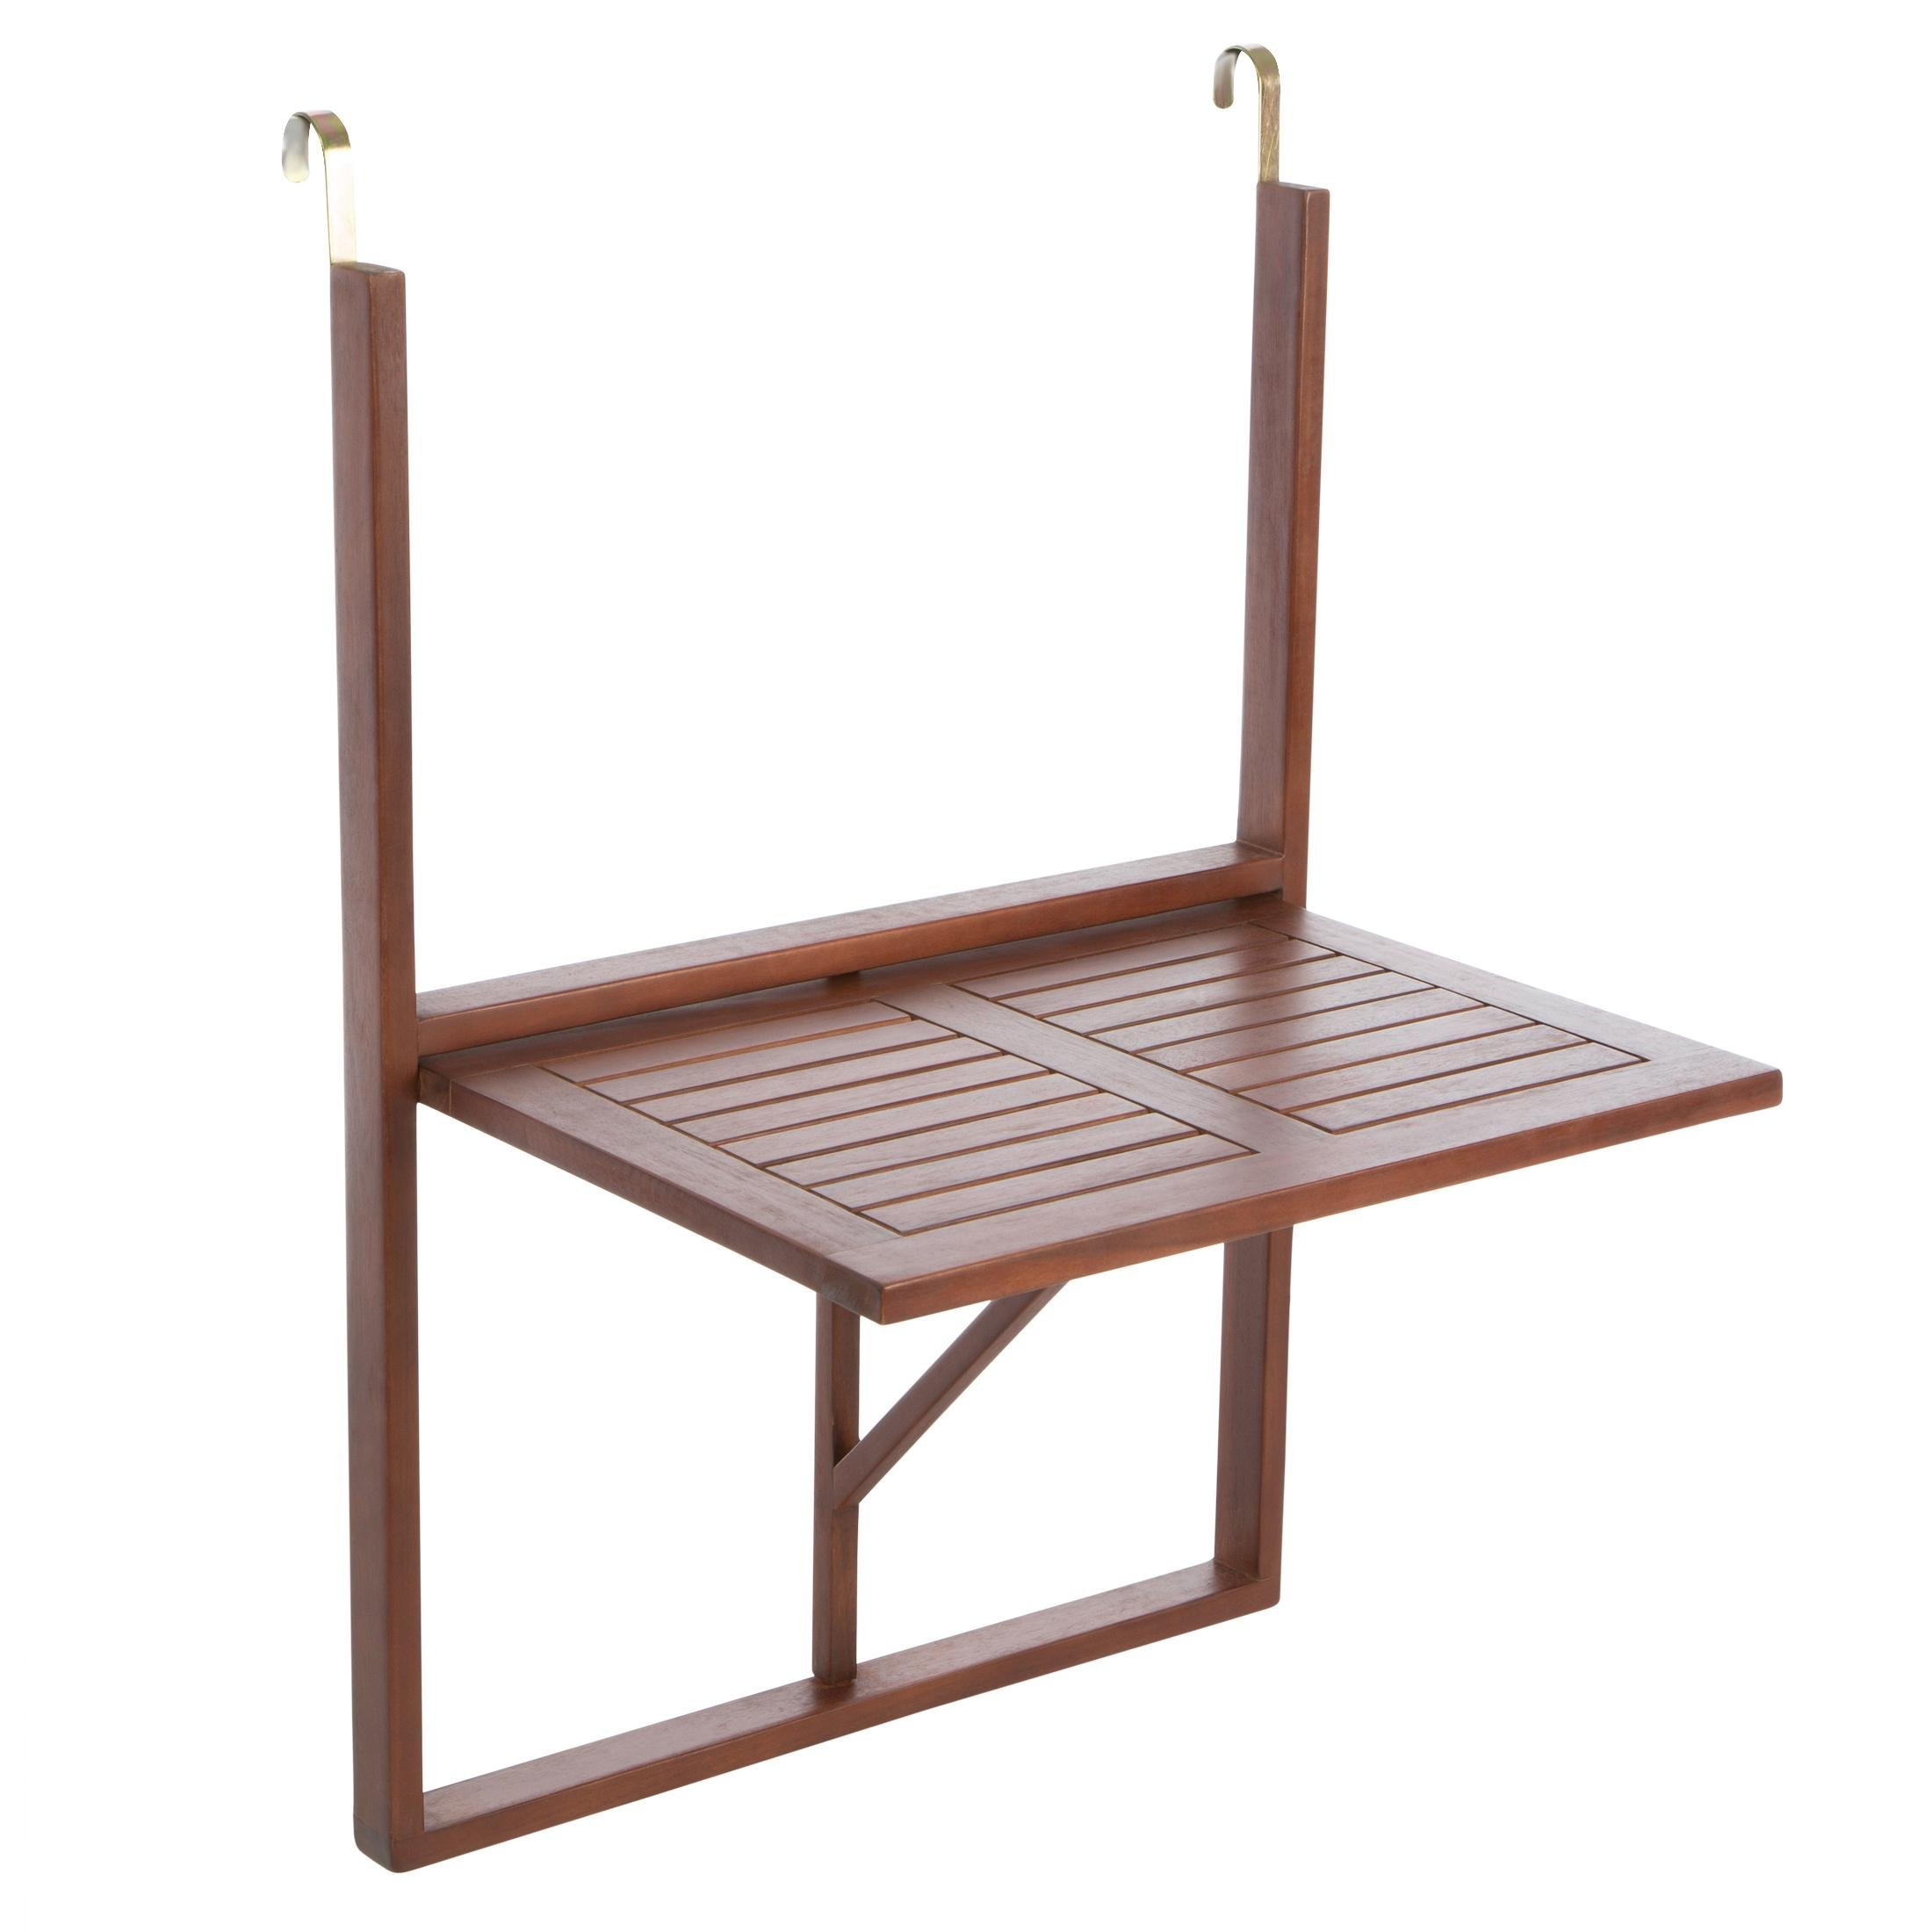 Tavoli legno pieghevoli interesting tavolo pieghevole for Tavoli amazon